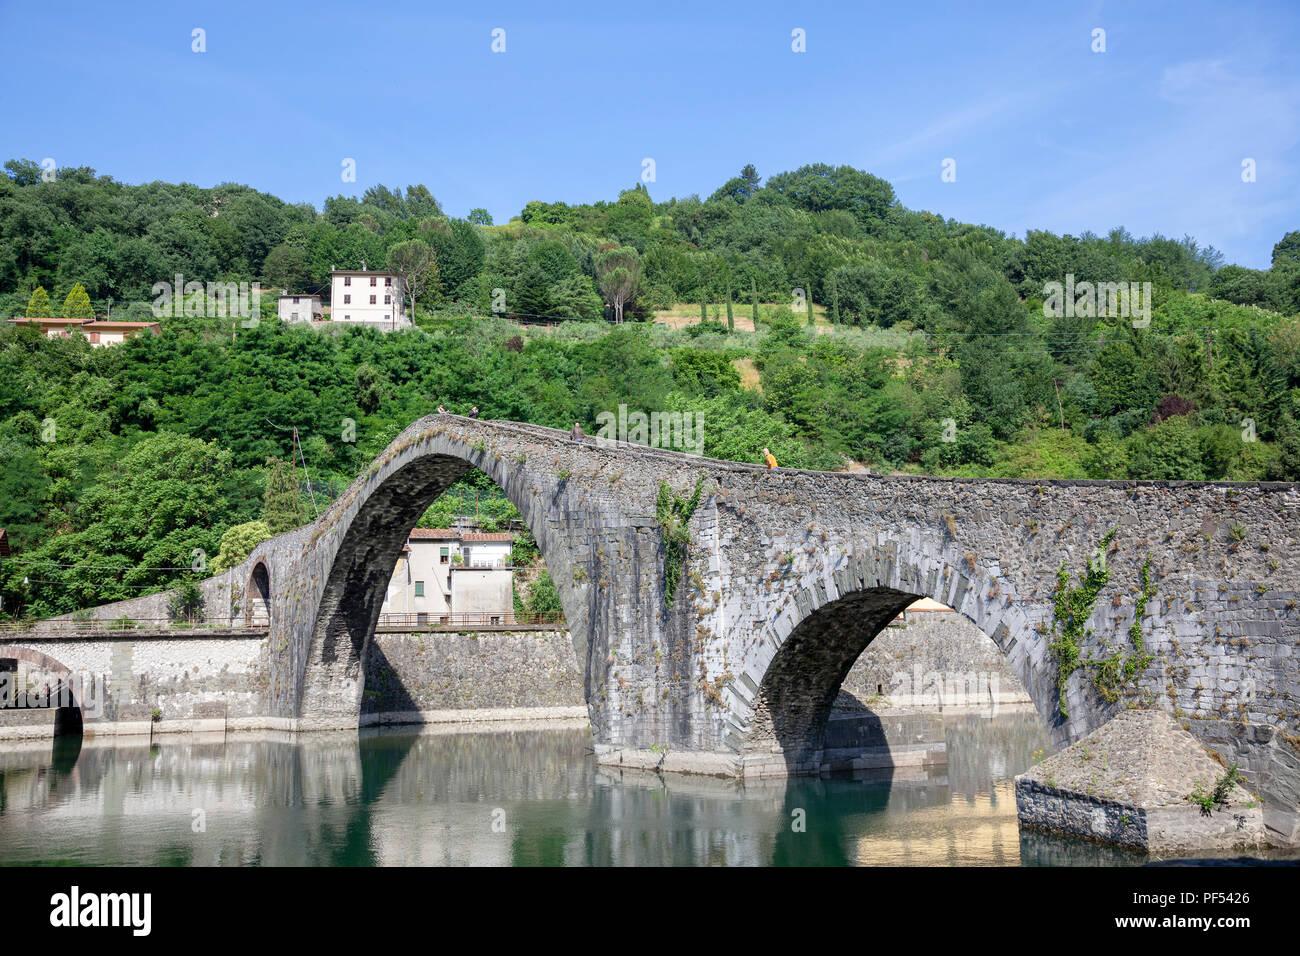 The odd five-arched bridge of Borgo a Mozzano (Tuscany - Italy) built on the Serchio river. - Stock Image